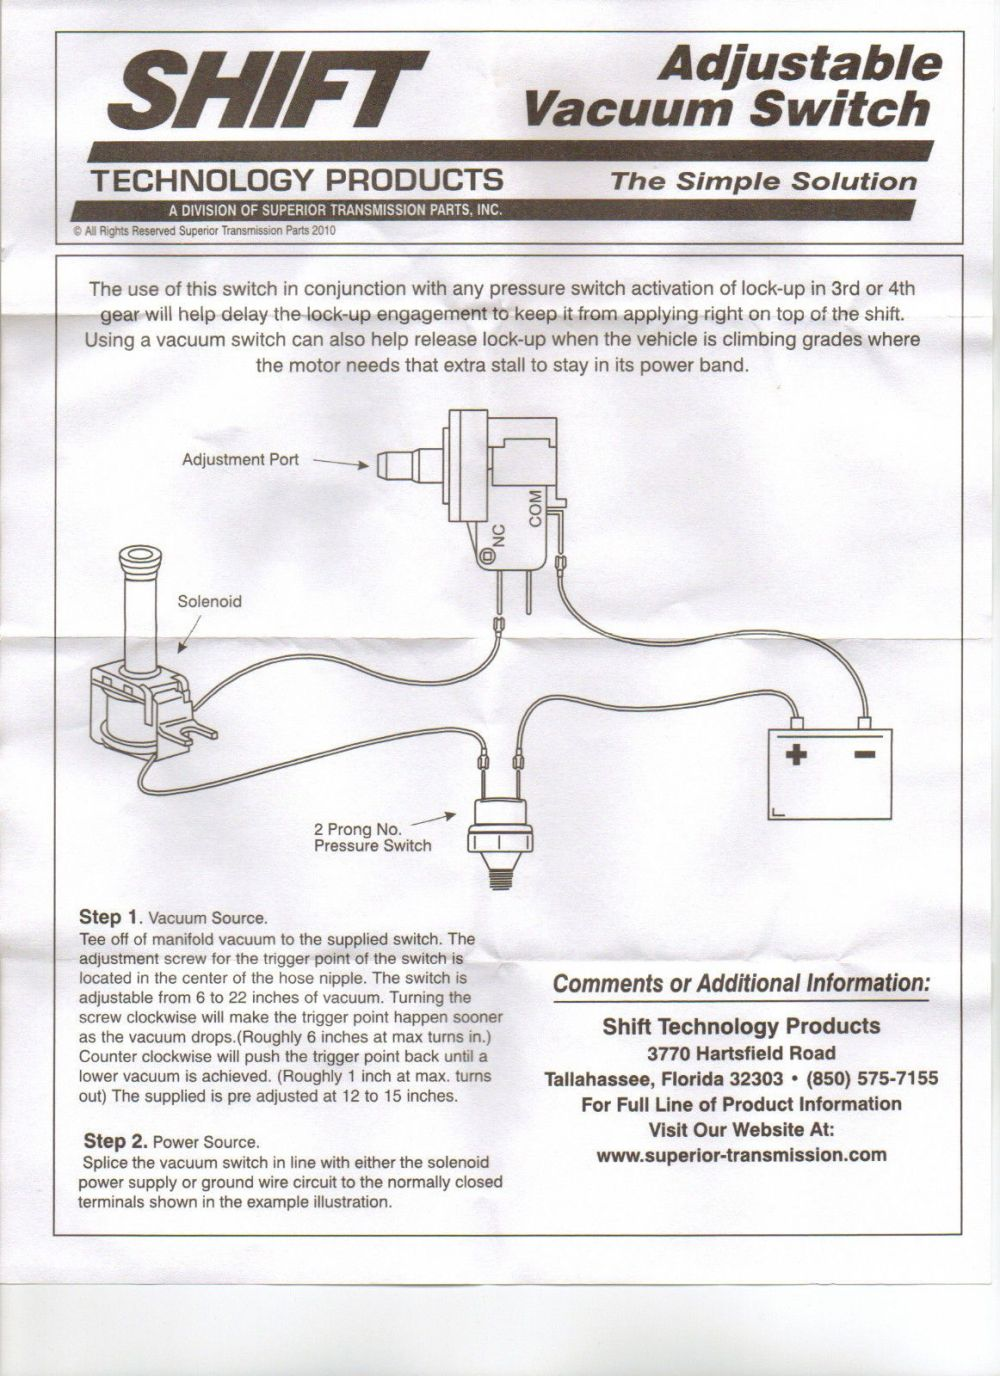 medium resolution of carb swap 700r4 4th gear lock up third generation f body message 700r4 wiring diagram vacuum switch